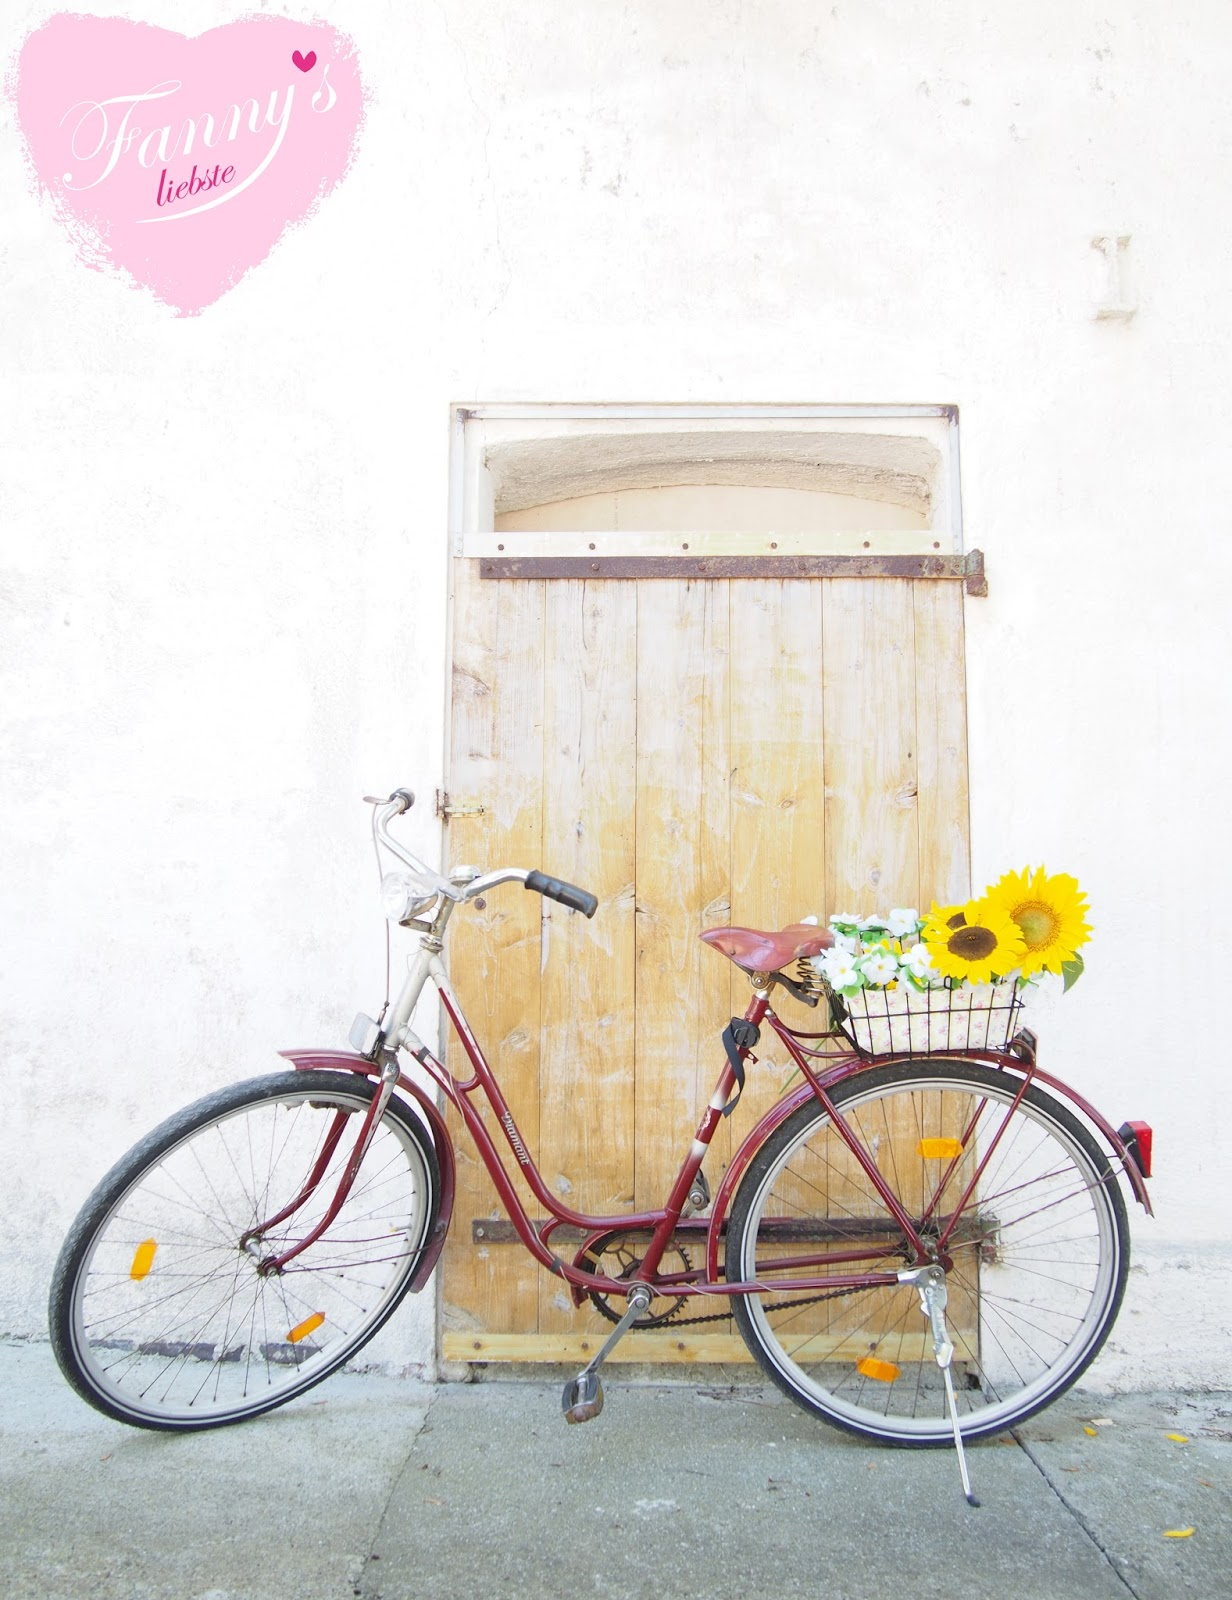 fahrrad blumen fanny s liebste. Black Bedroom Furniture Sets. Home Design Ideas